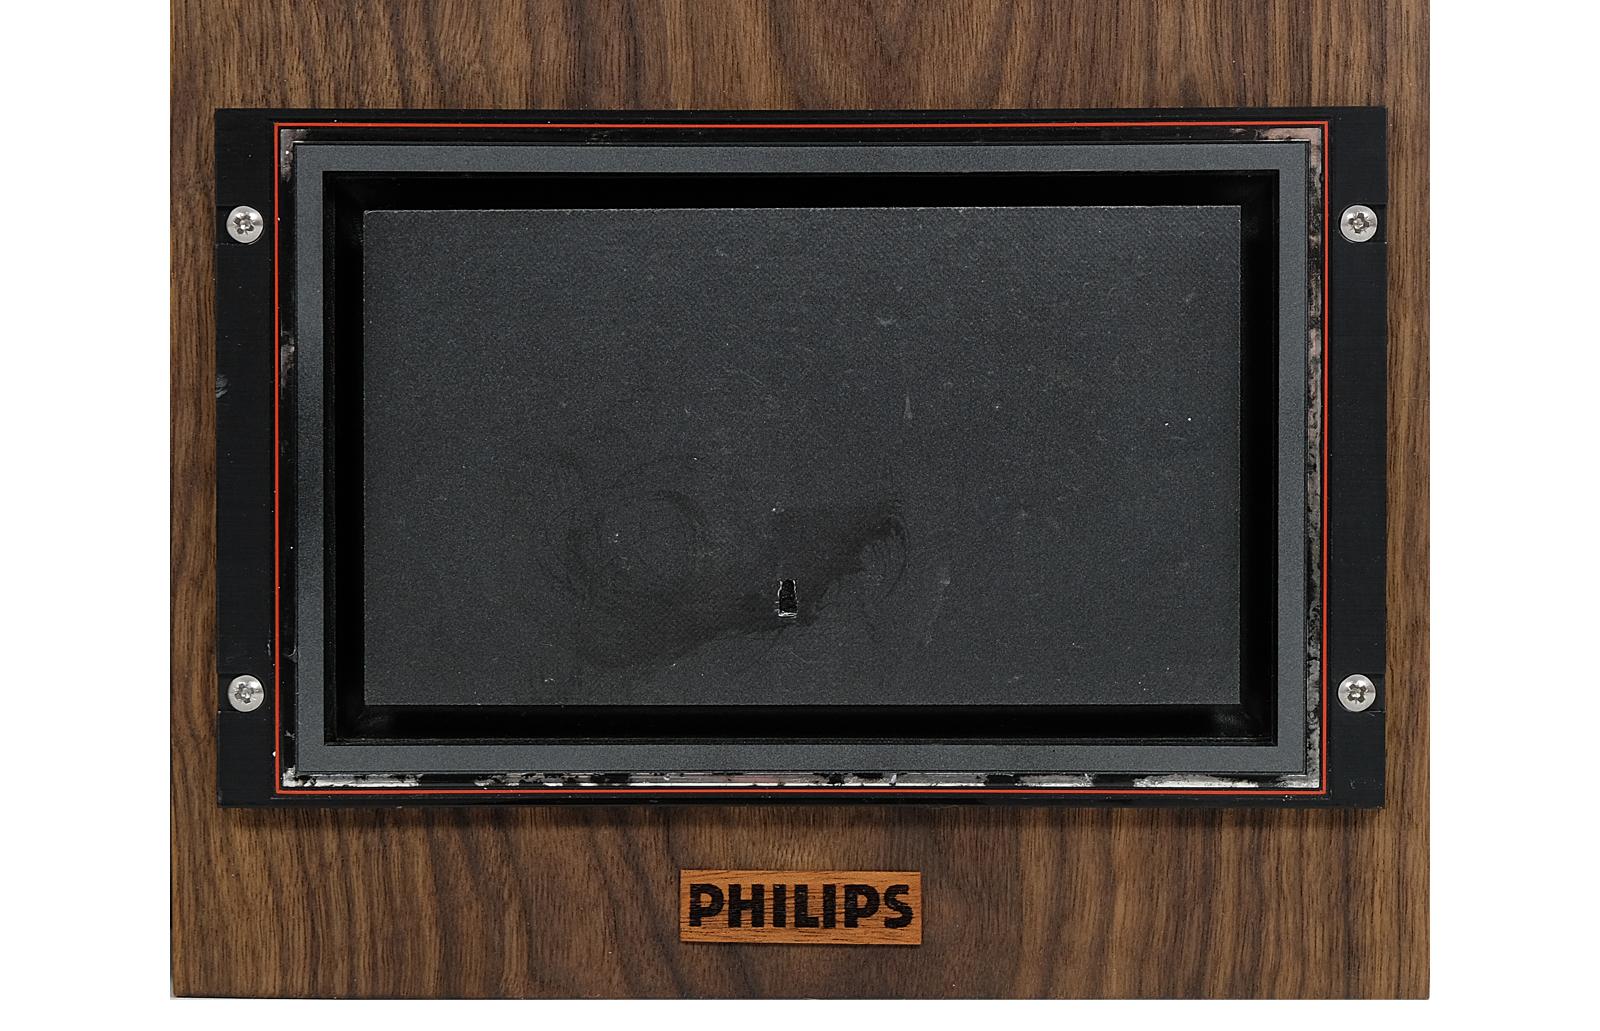 Philips F9434